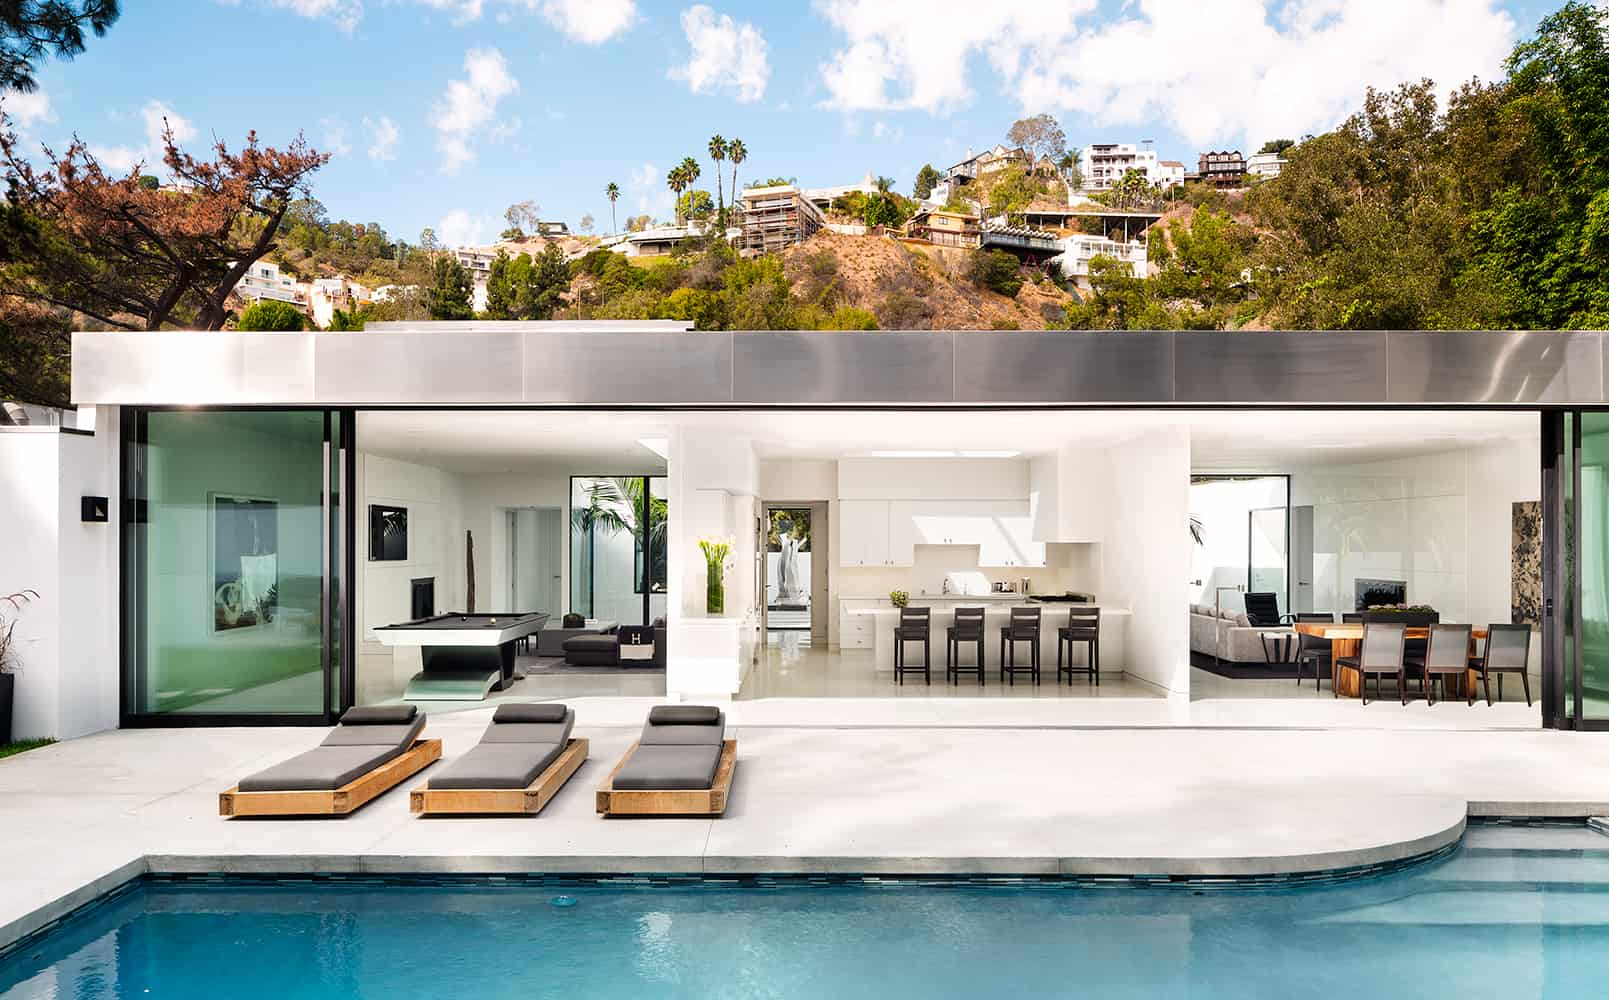 Modern-Home-Renovation-Belzberg Architects-03-1 Kindesign